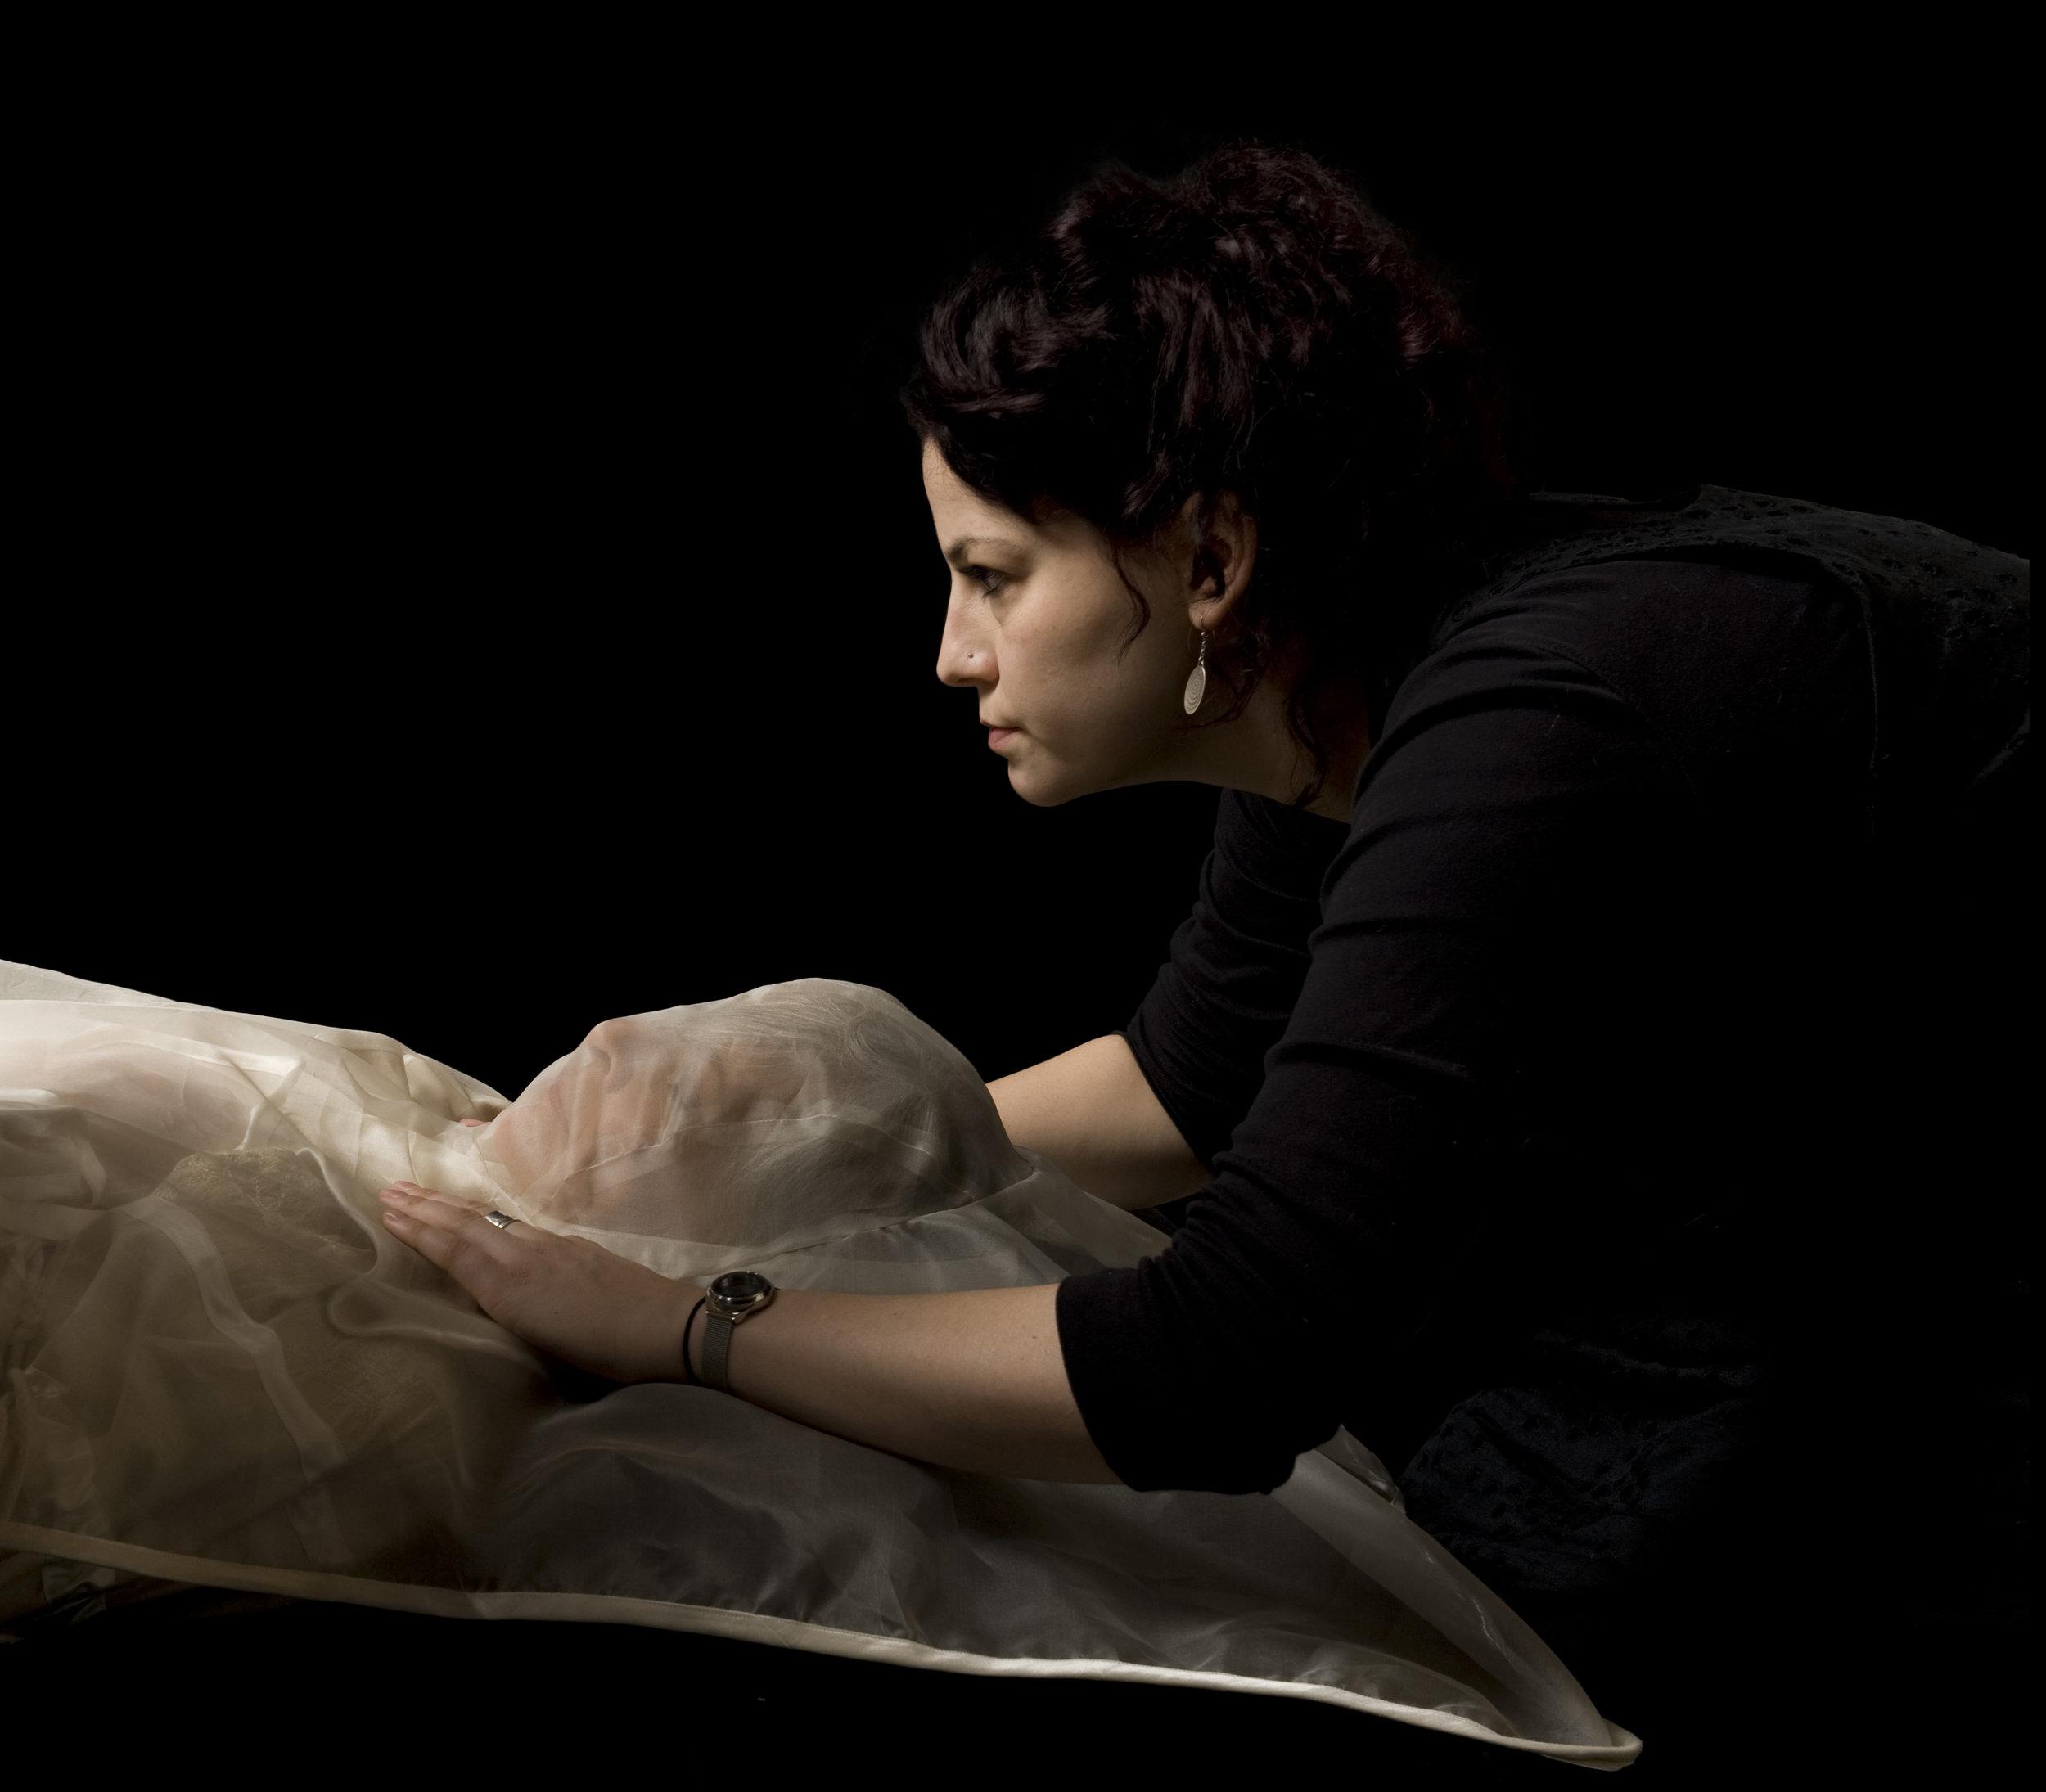 Prototype Dressing 'Garment For The Grave' by Pia Interlandi Image by Devika Bilimoria